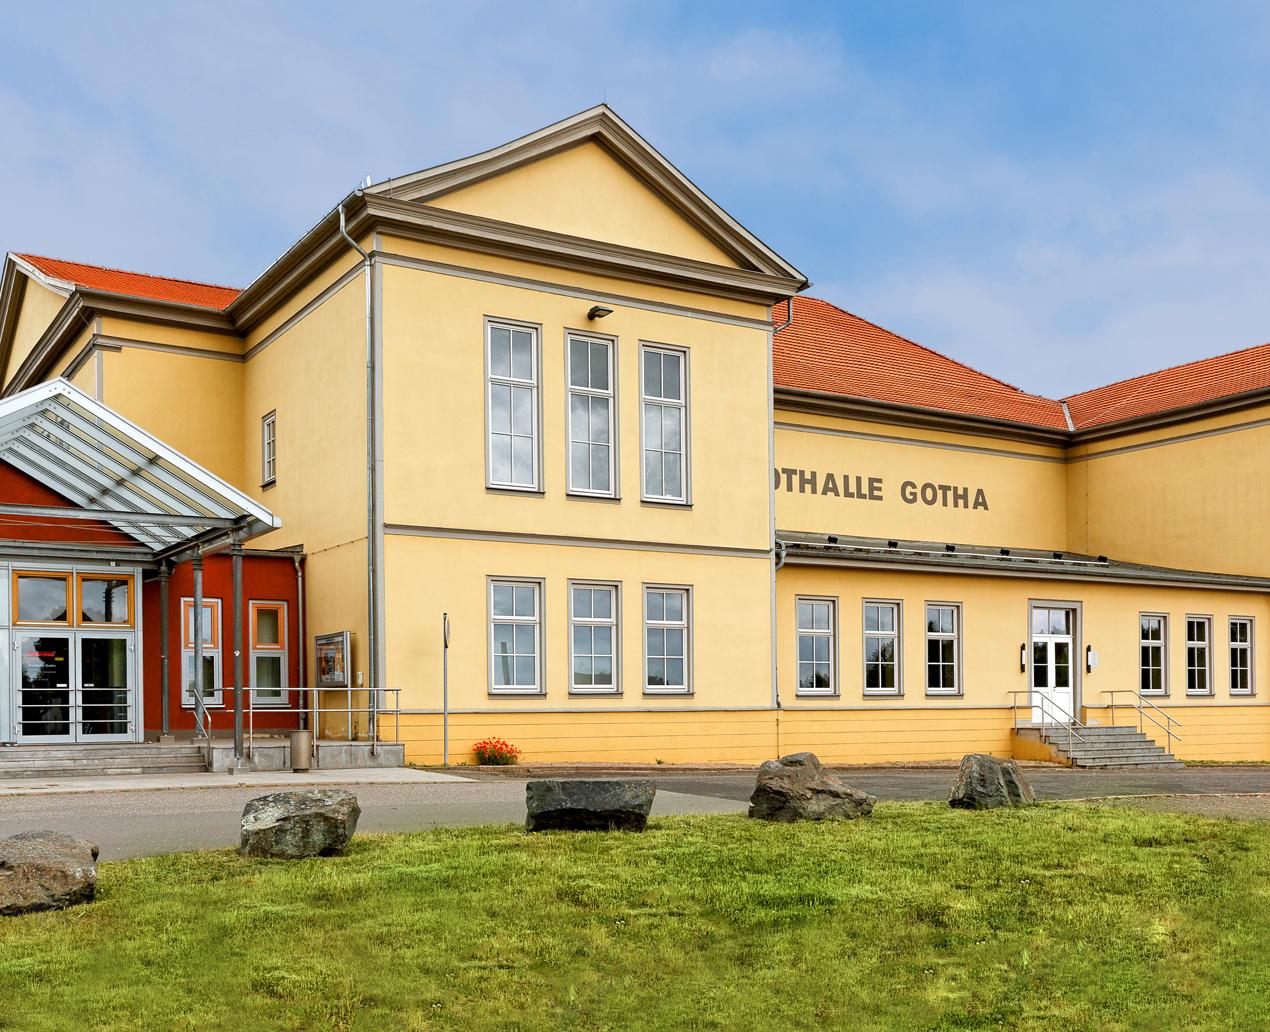 Stadthalle Gotha ©Bernd Seydel